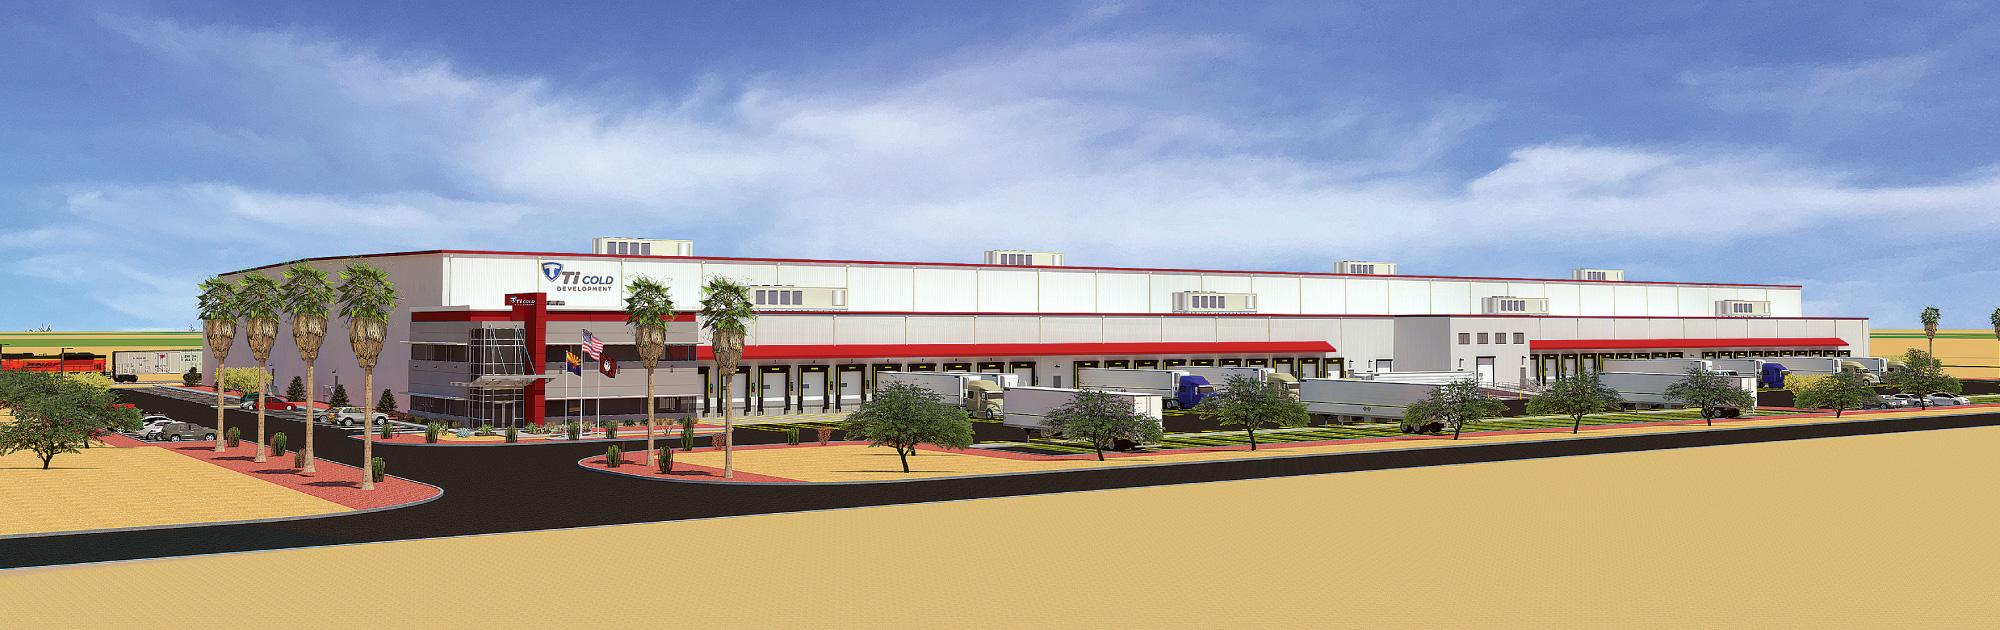 Phoenix AZ- Ti Cold Development Storage Facility Rendering